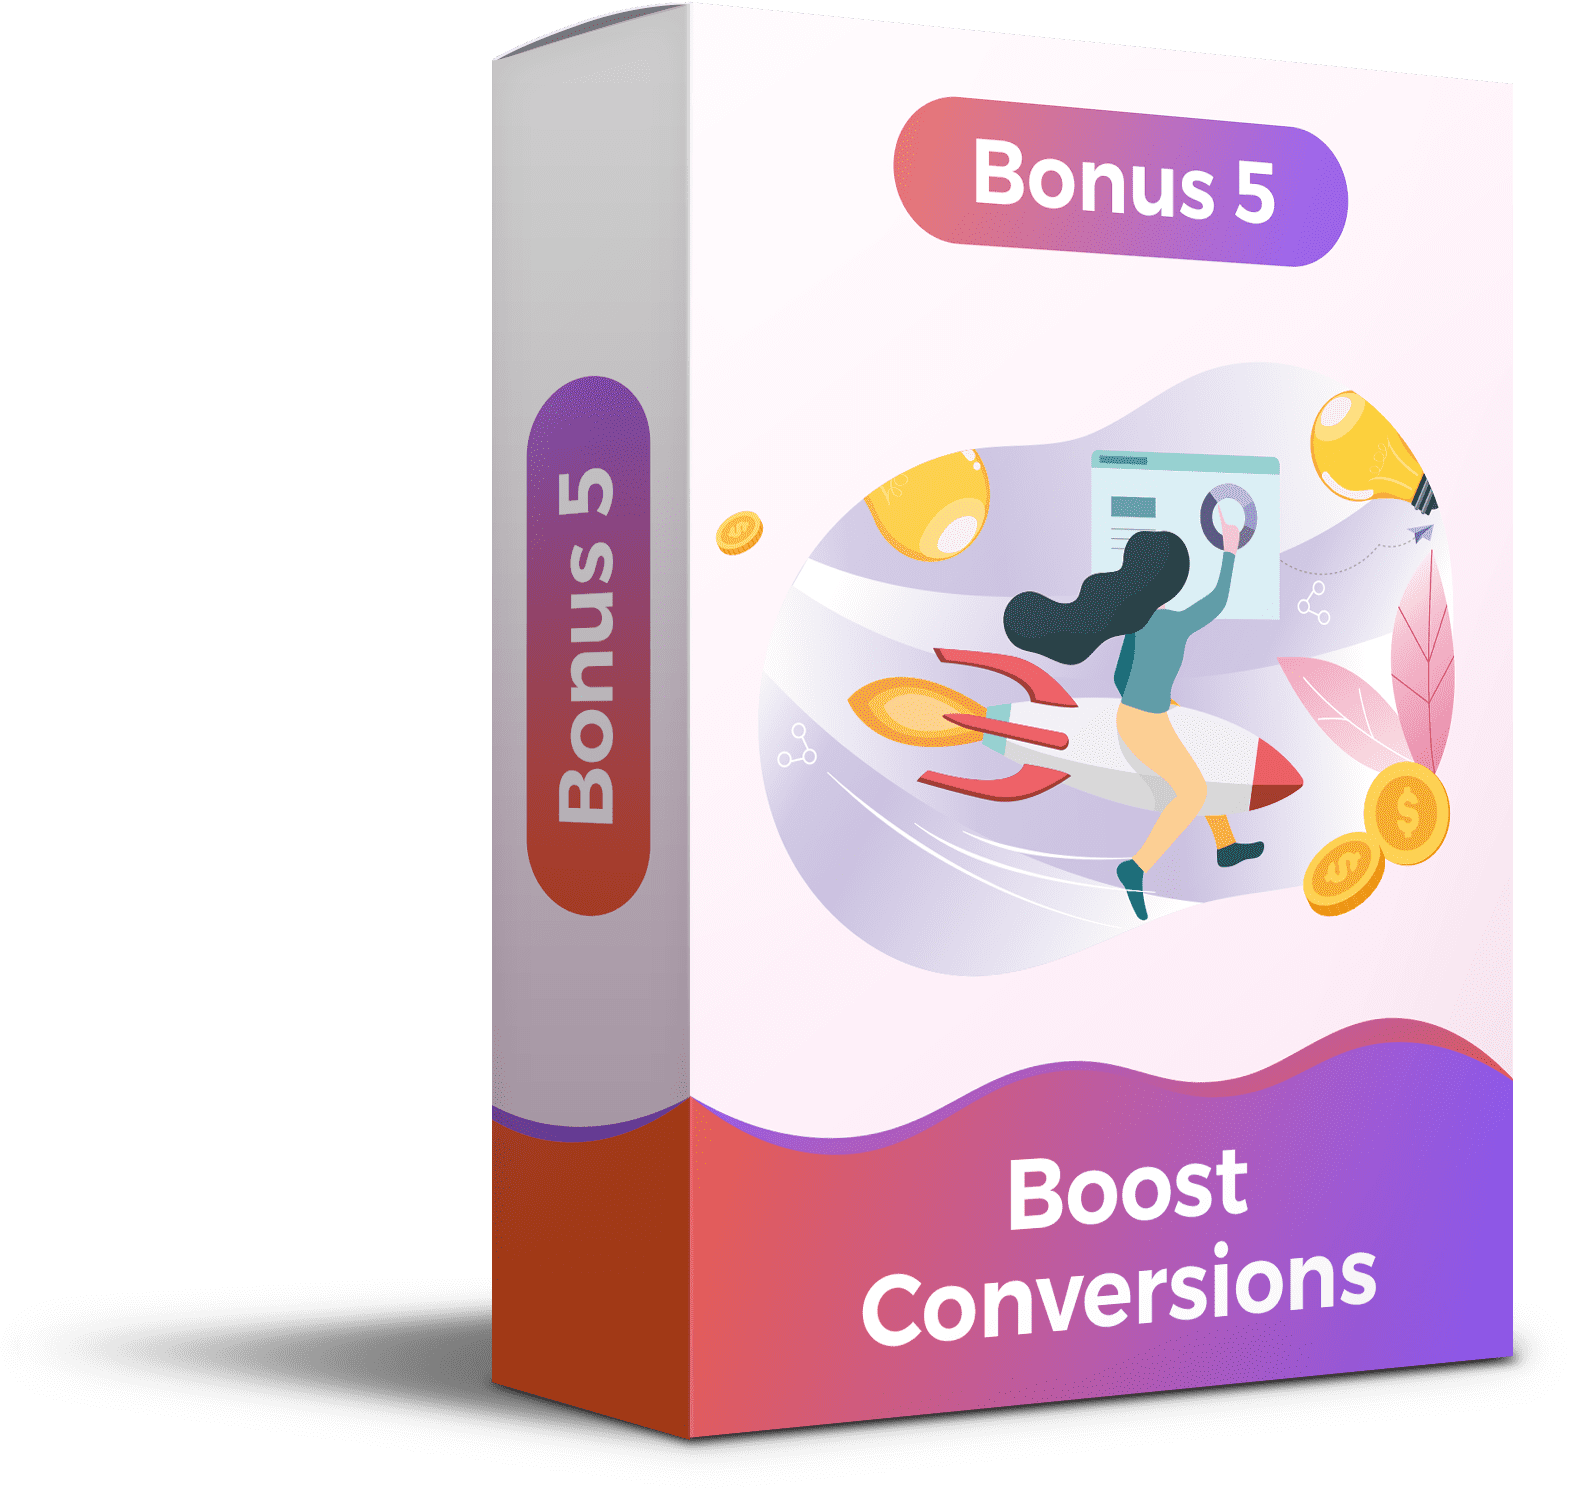 Boost Conversions